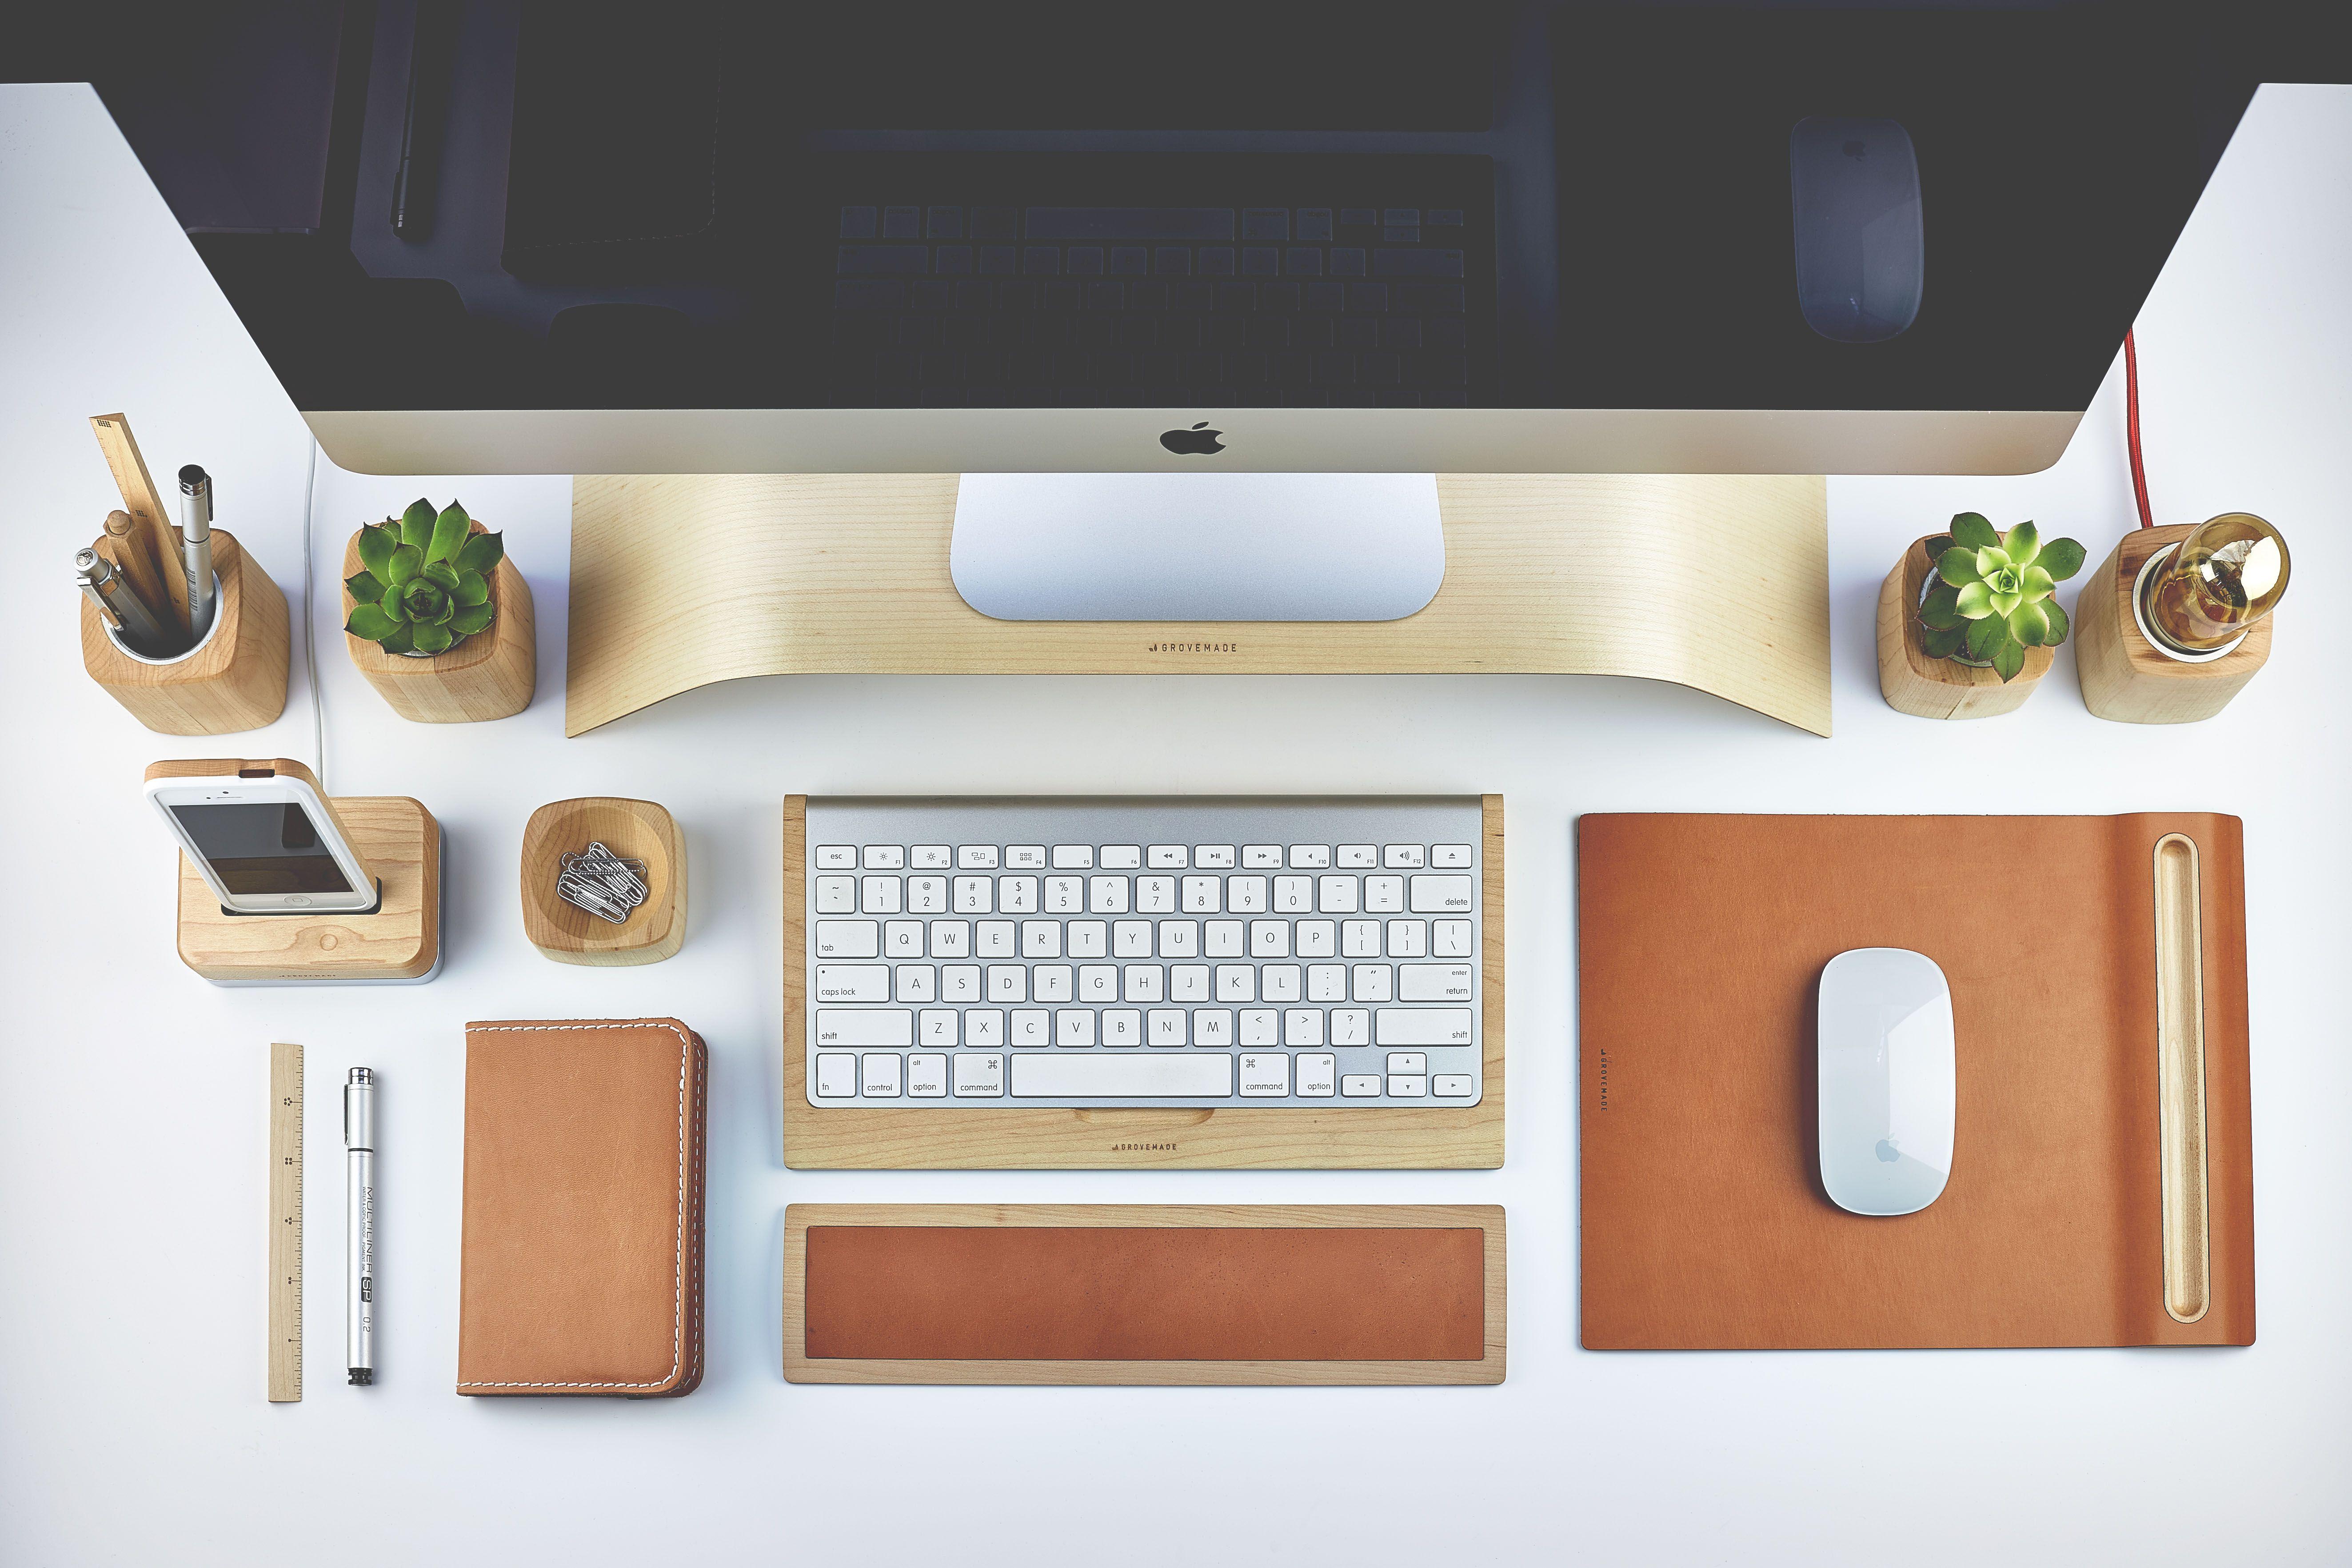 Amazing Home Office Accessories Best Home Office Designs Home Office Desk Collections Home Office Desks Furniture Designer Home Off Ruang Kerja Fotografi Pin